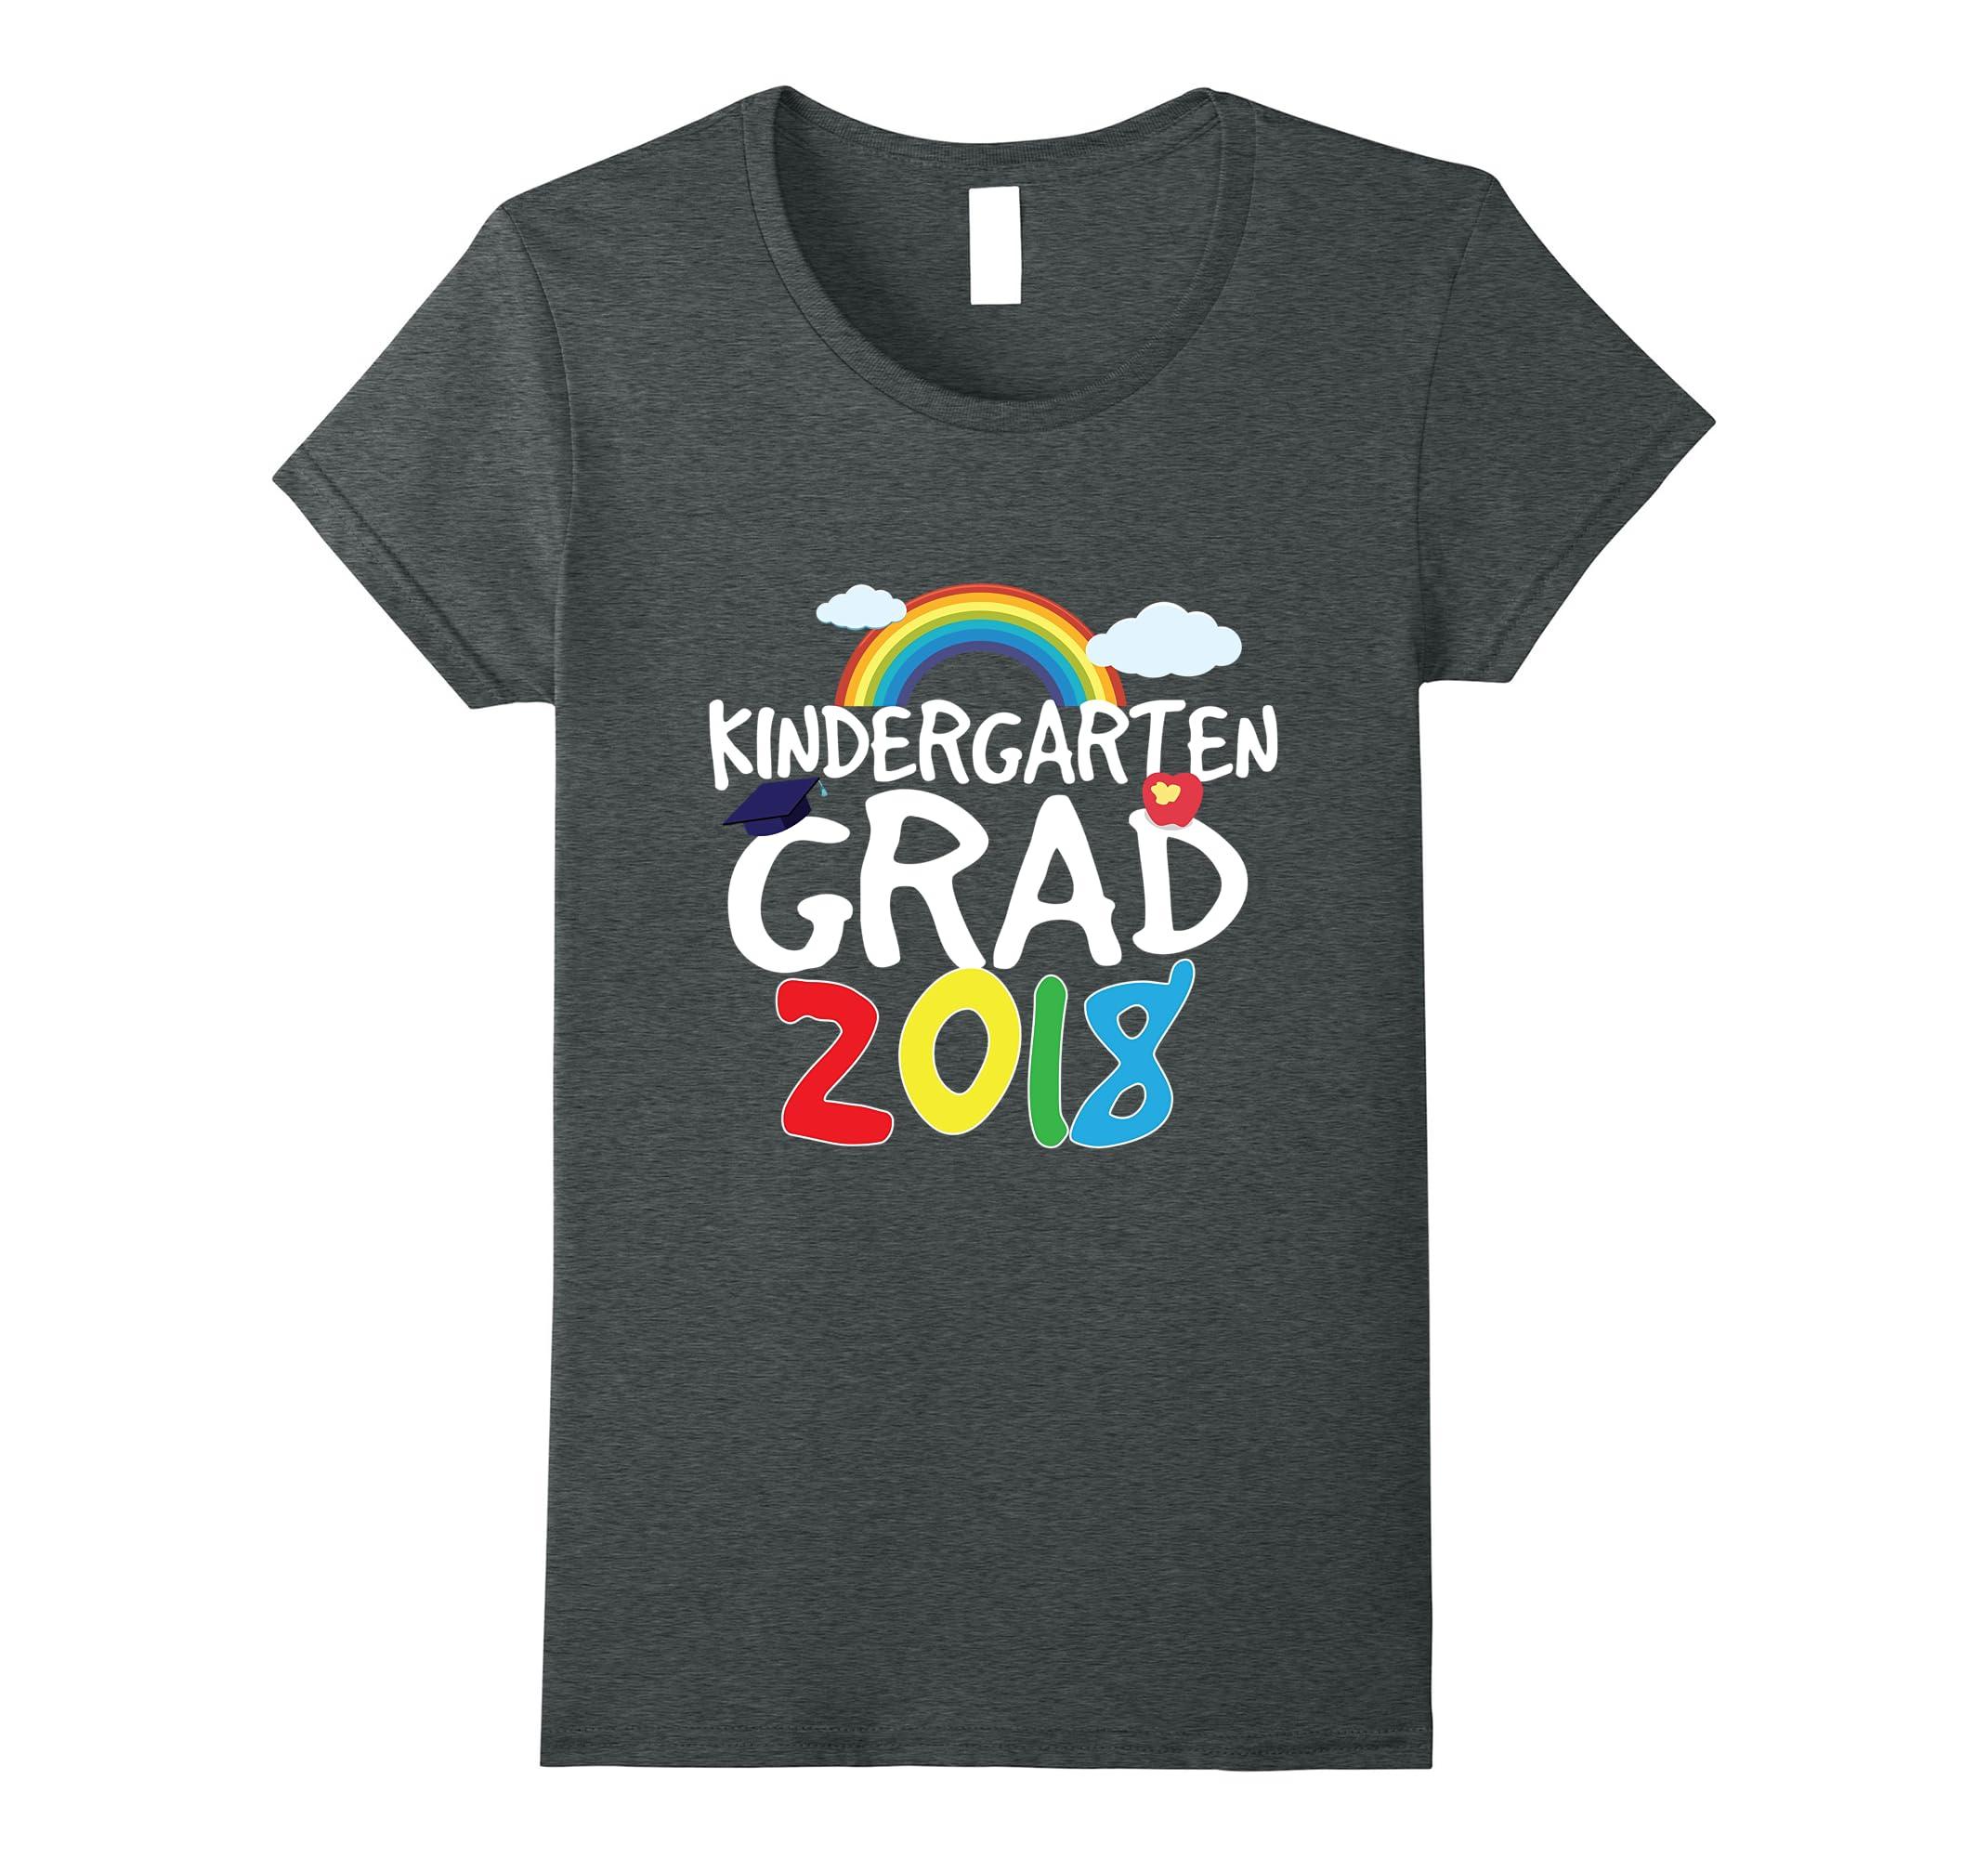 Kindergarten Graduation T-Shirt 2018 Last Day of School Gift-Newstyleth